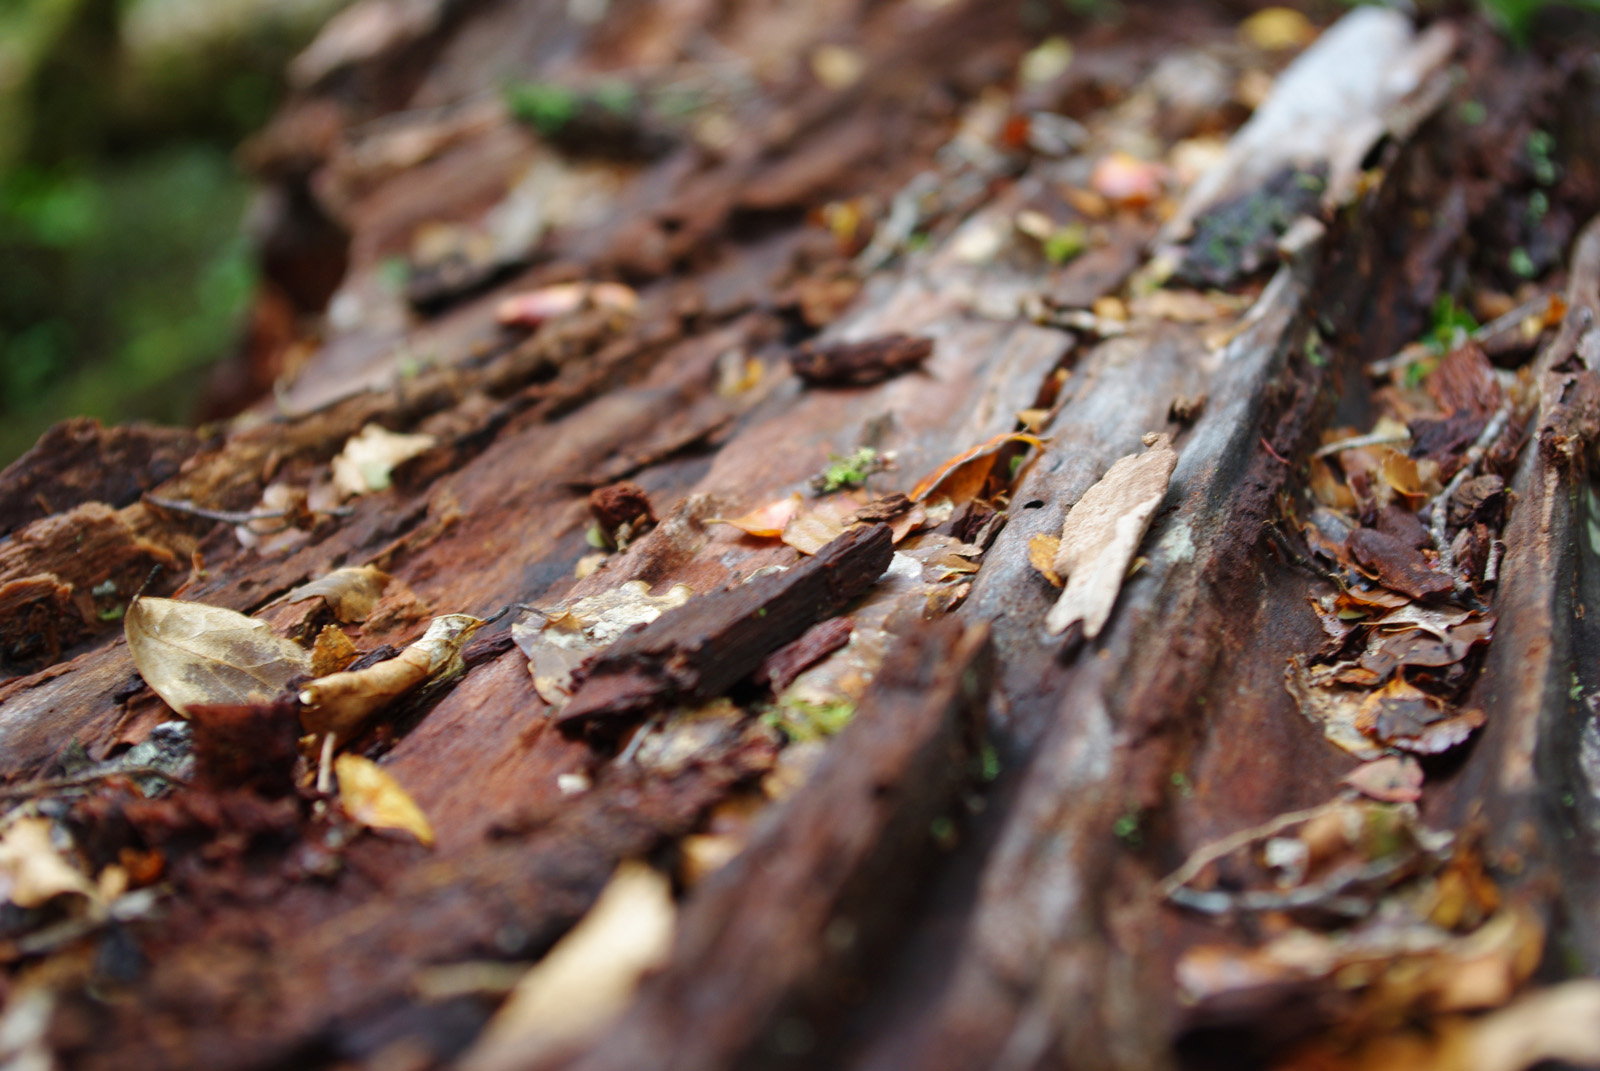 Rotten bark details